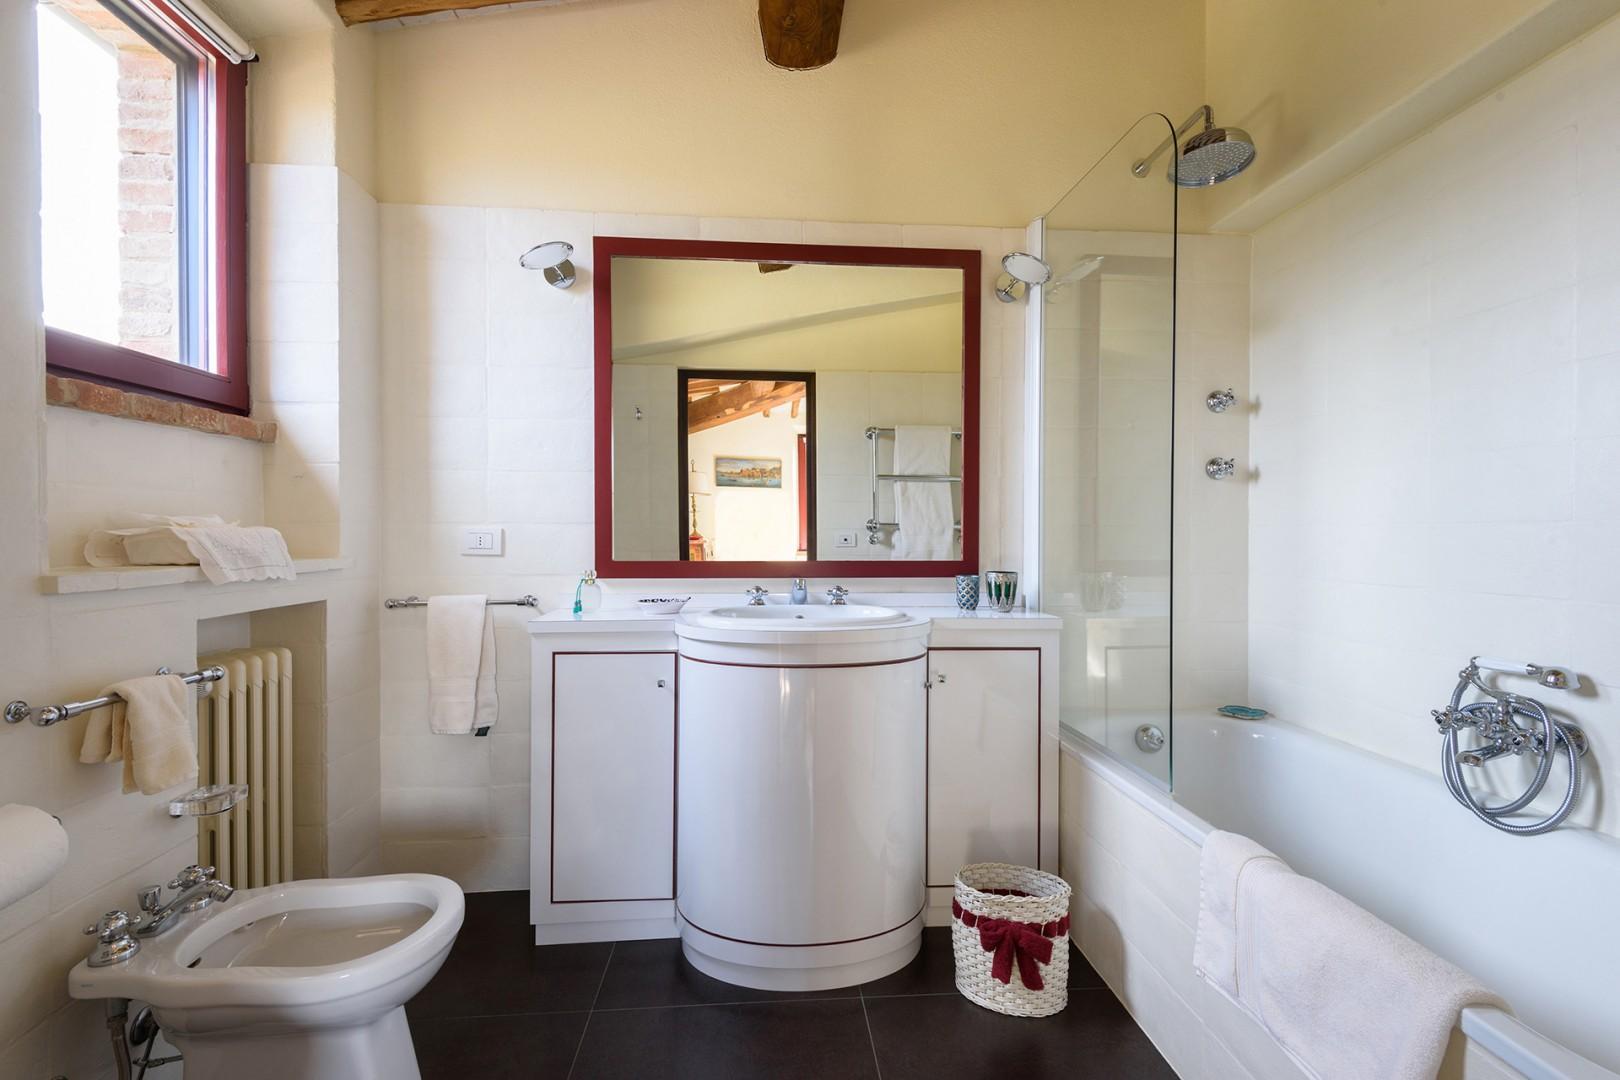 Bathroom with combination bathtub/shower and rainfall showerhead.